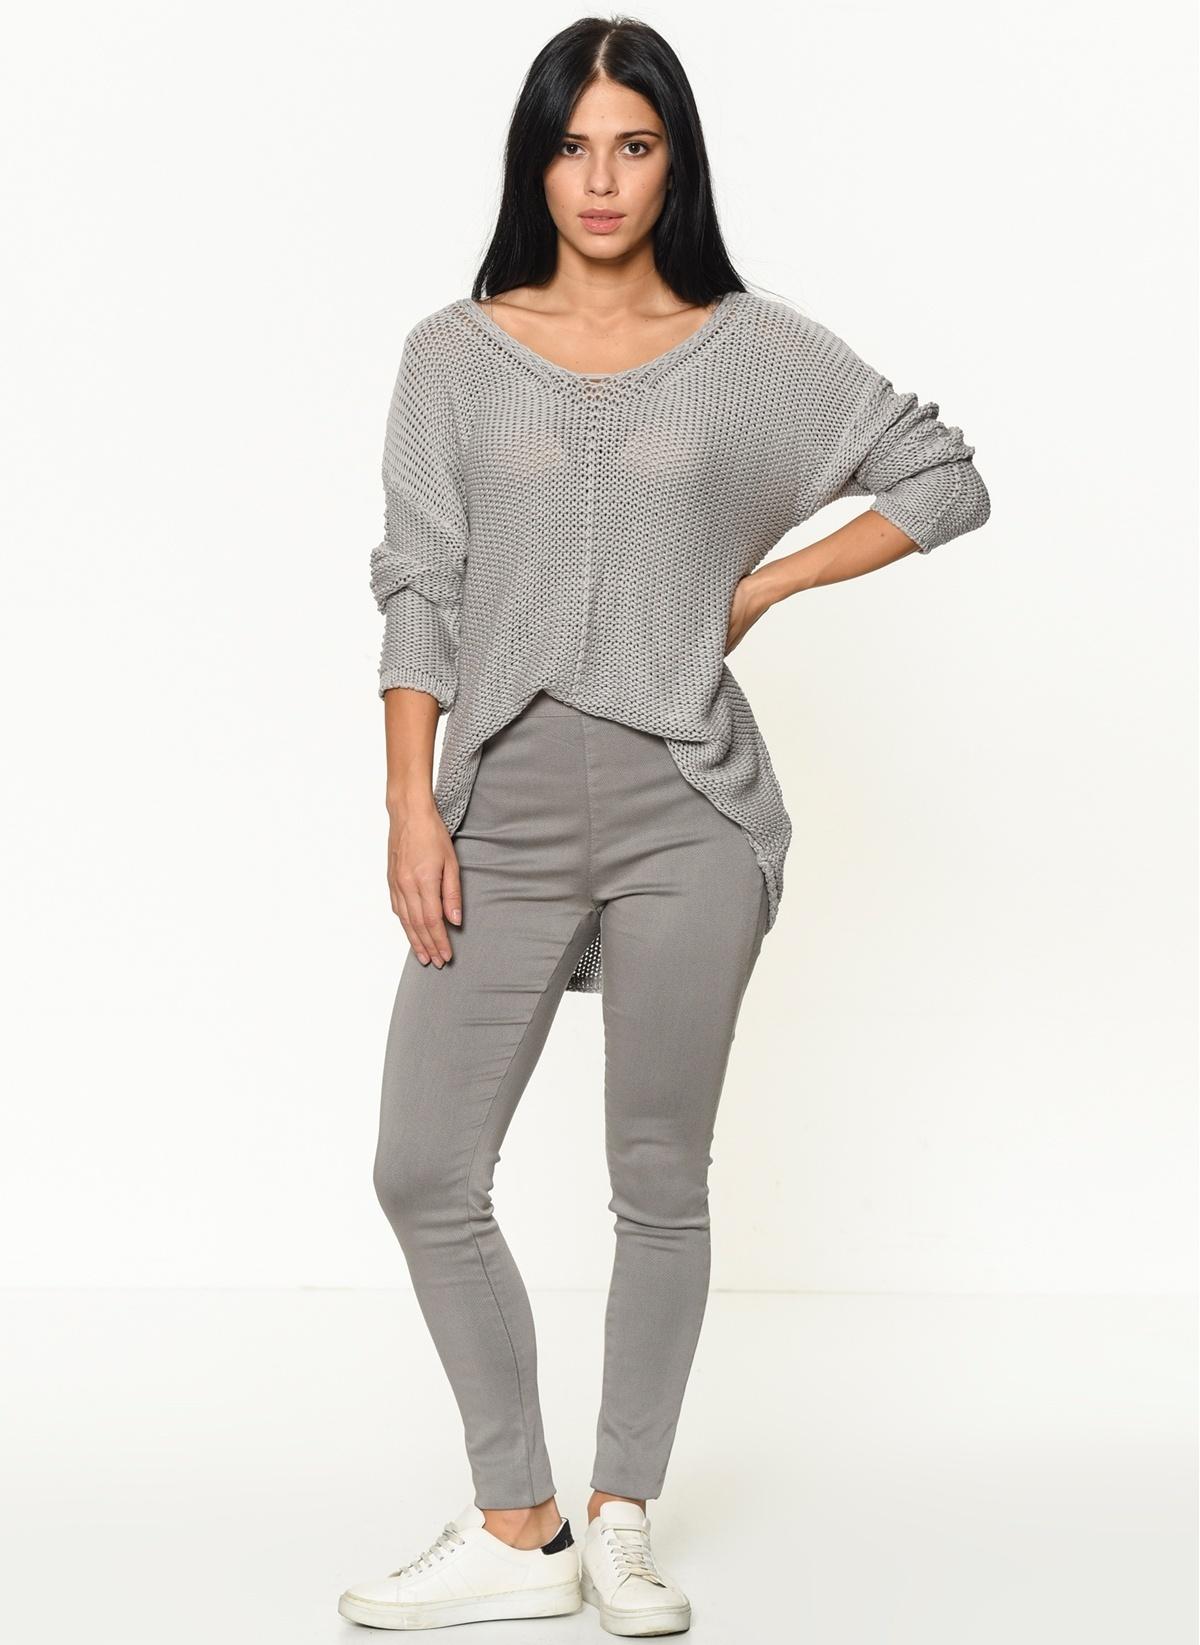 Braez Pantolon 5001130fw1804 Perıa Trousers – 197.5 TL